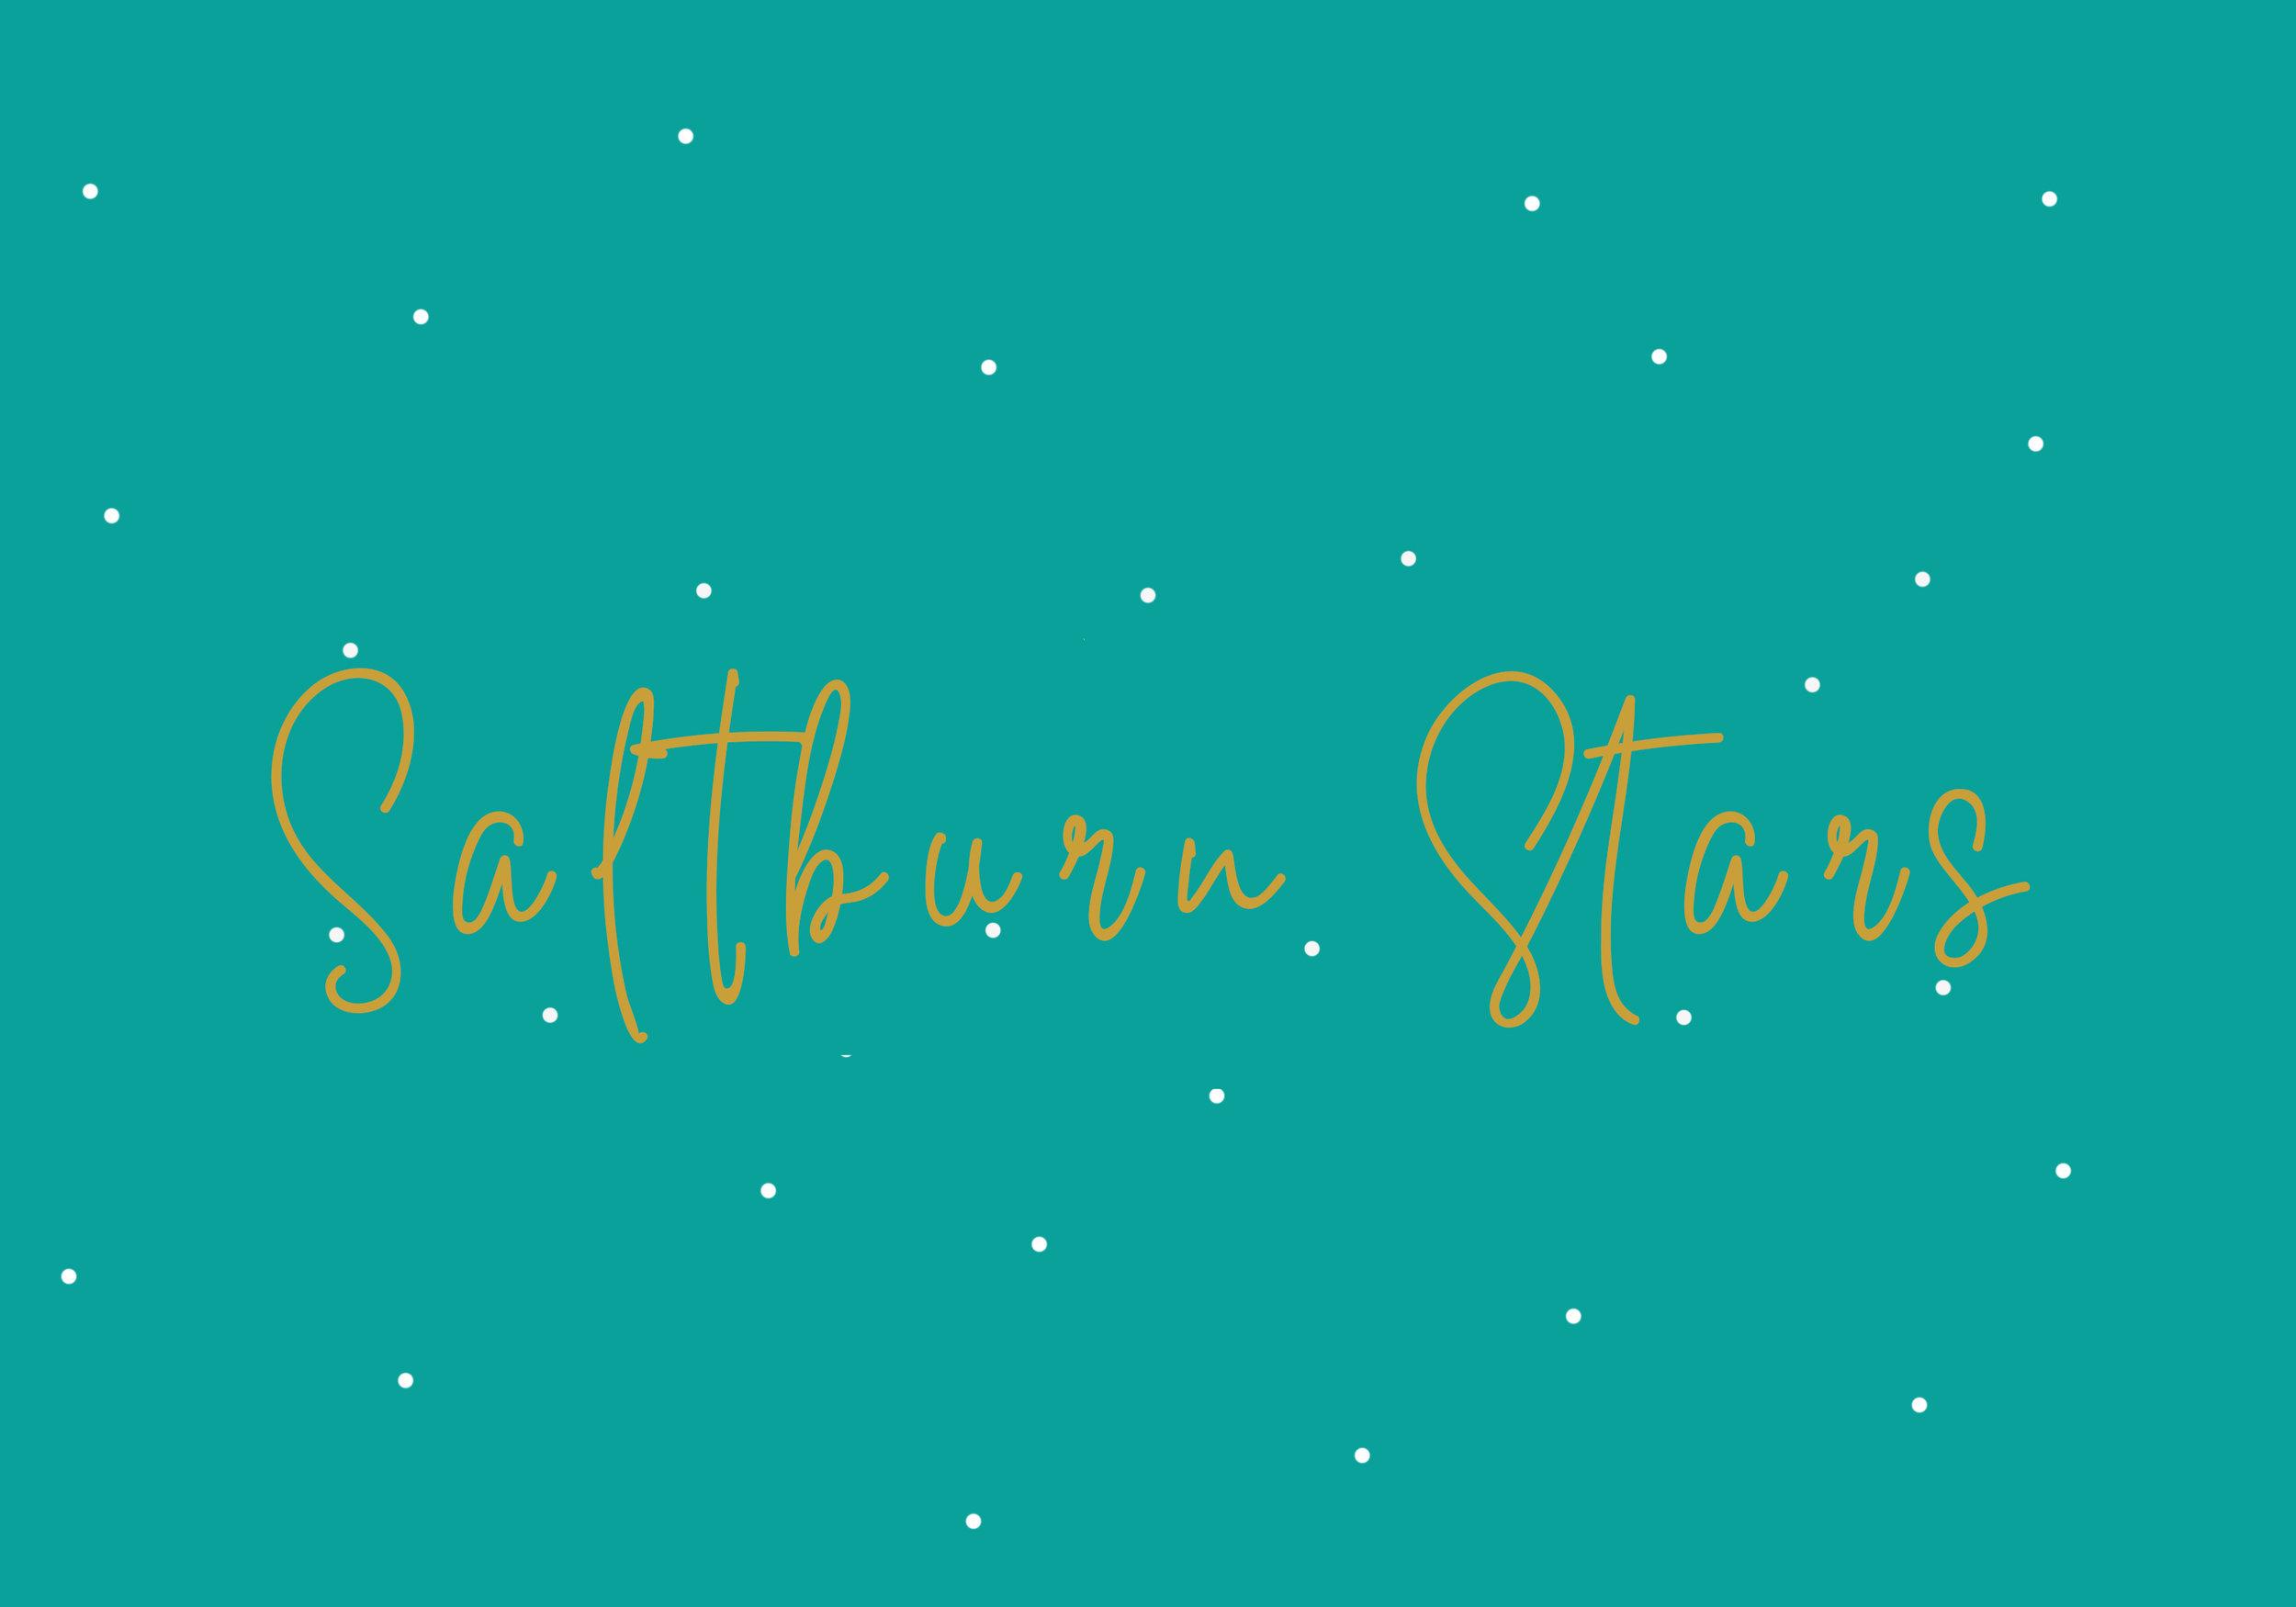 SALTBURN RETAILERS - Branding and marketing assets designs